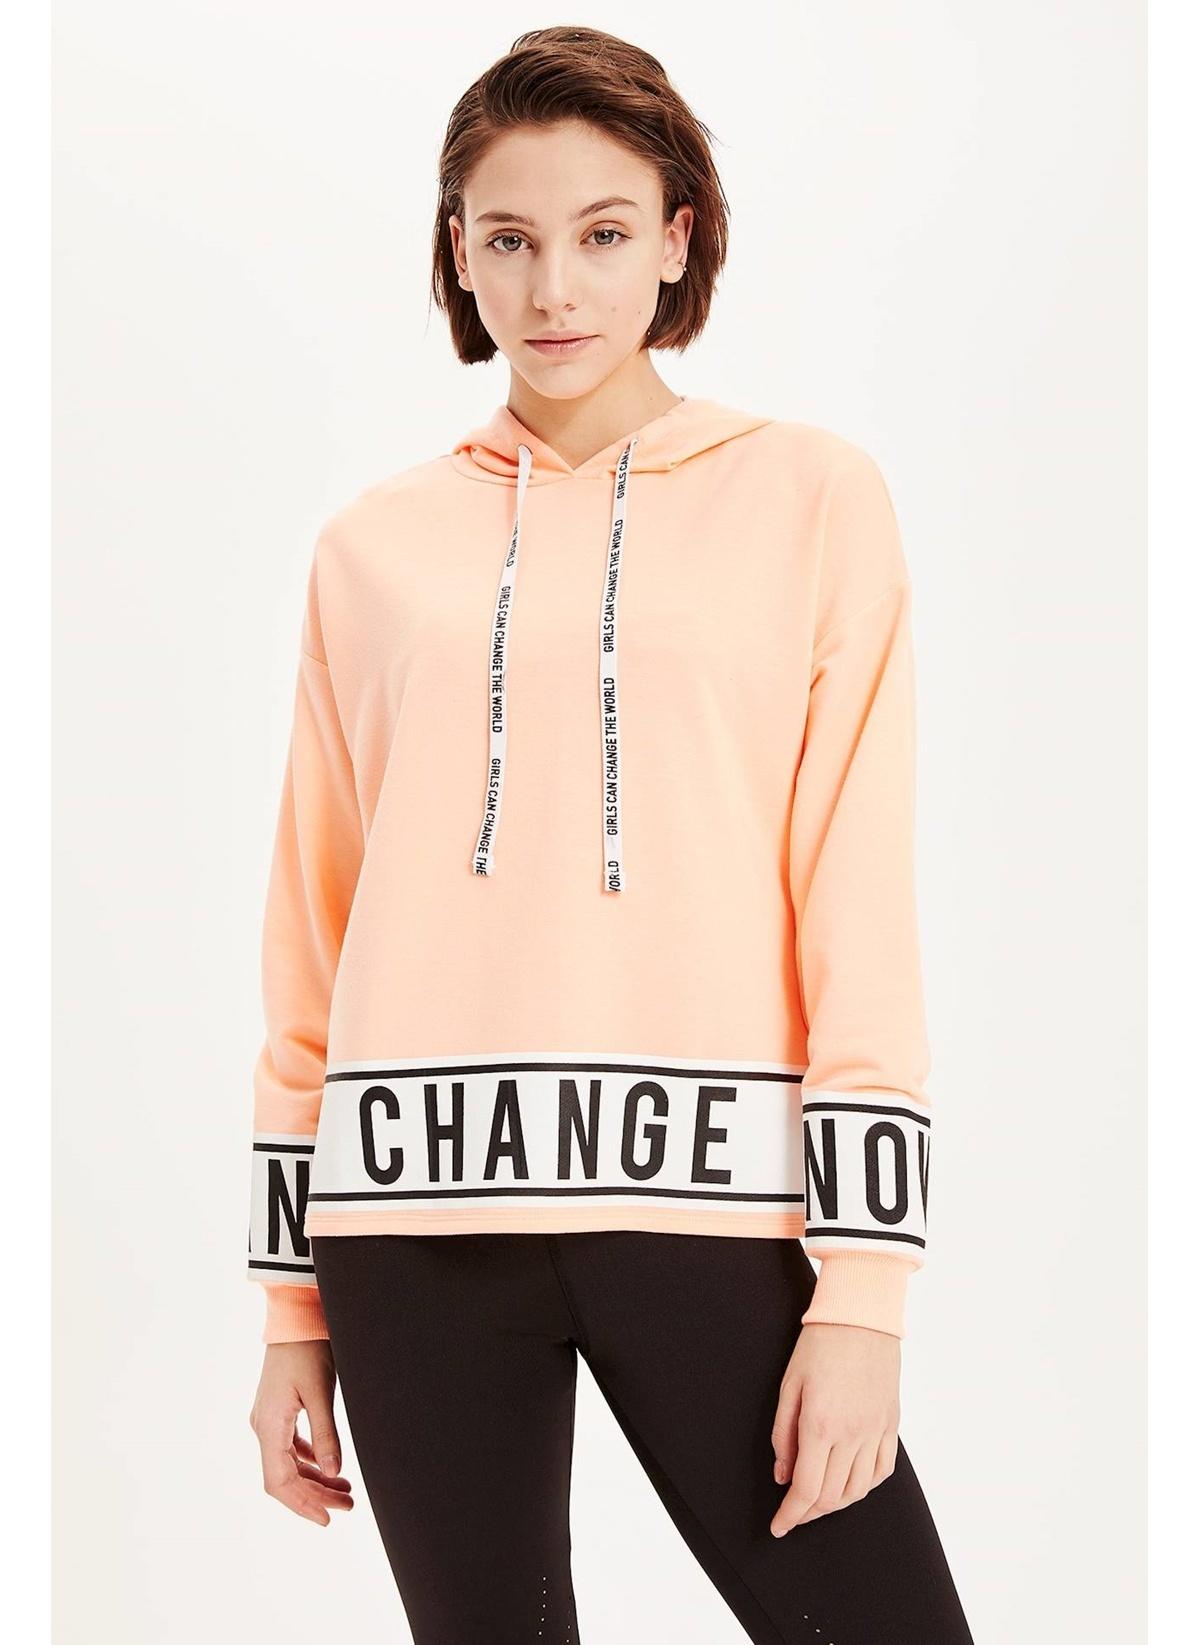 Defacto Kapşonlu Slogan Baskılı Sweatshirt K4847az19spog384sweatshirt – 29.99 TL